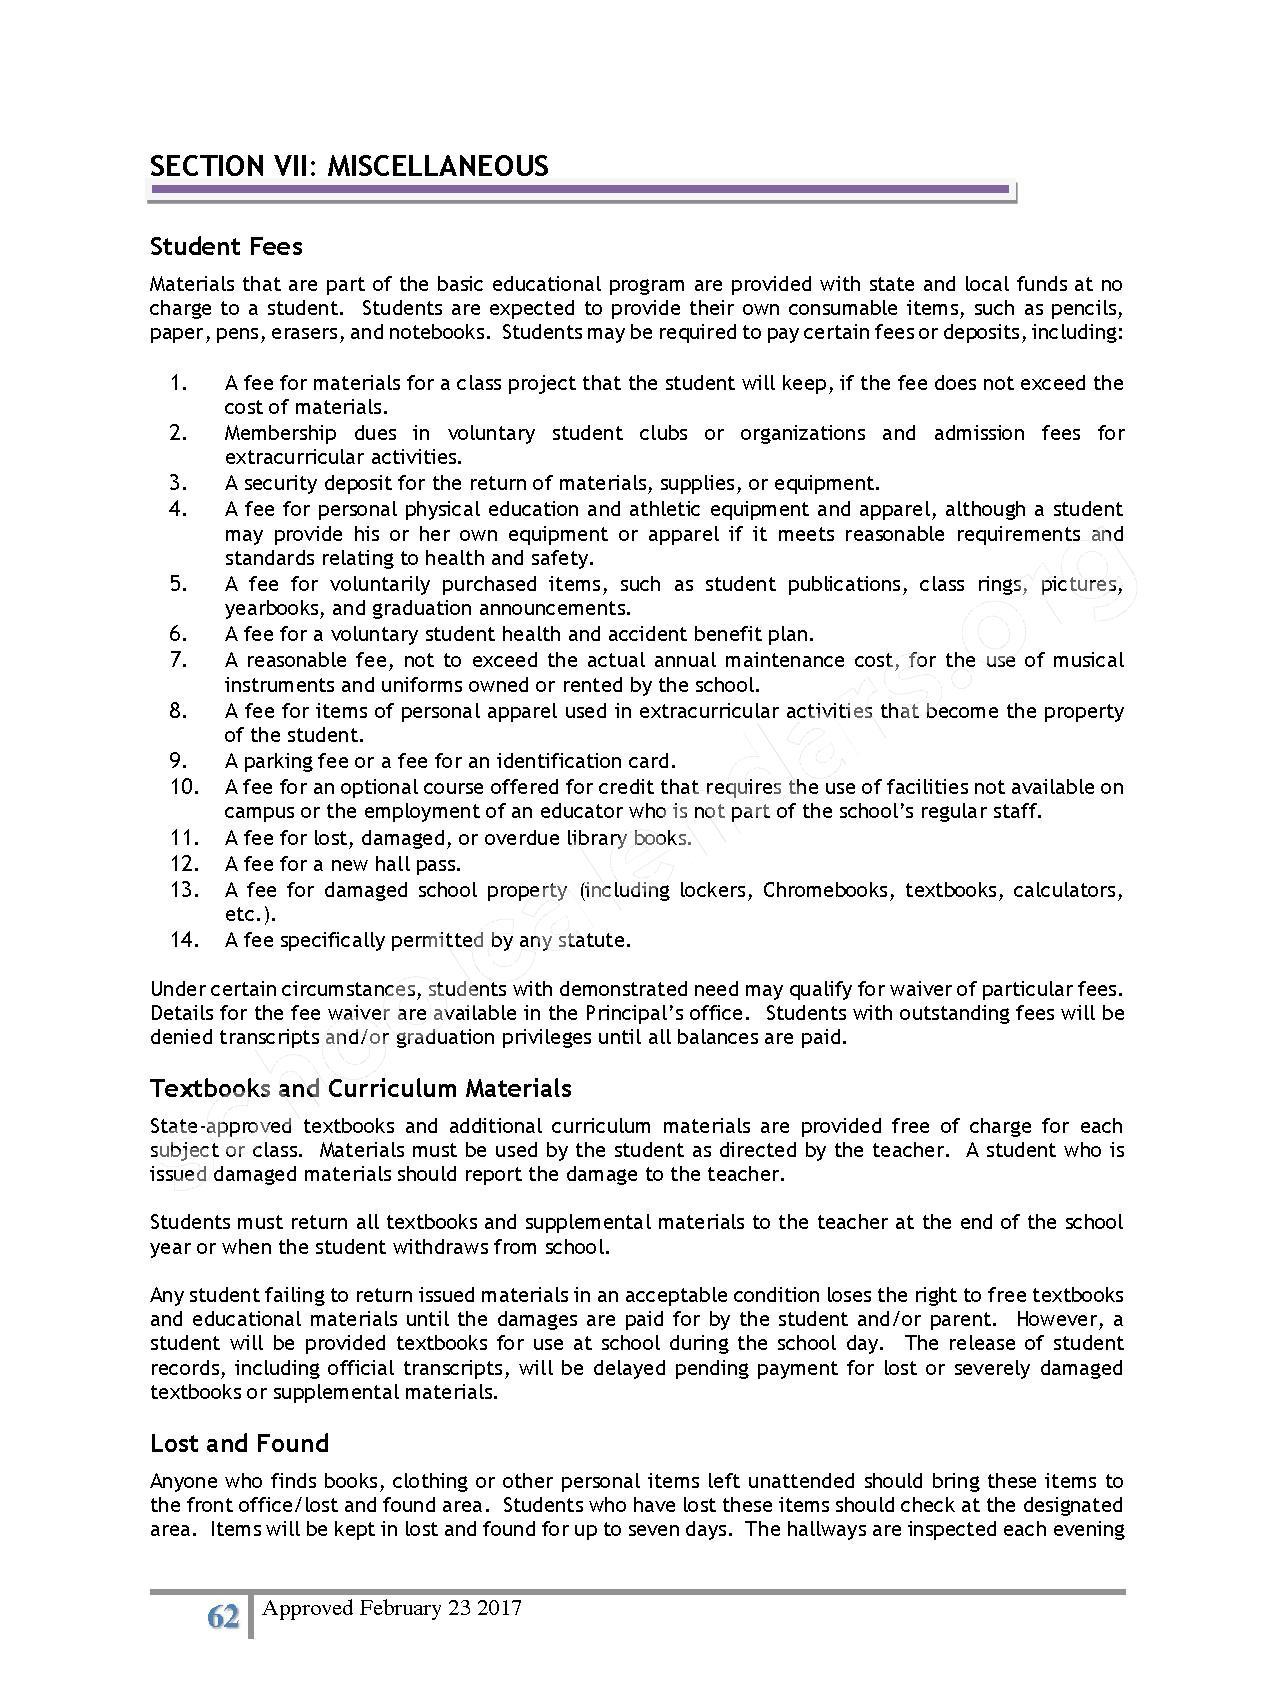 2016 - 2017 District Calendar – Lisa Academy Public Charter Schools – page 62